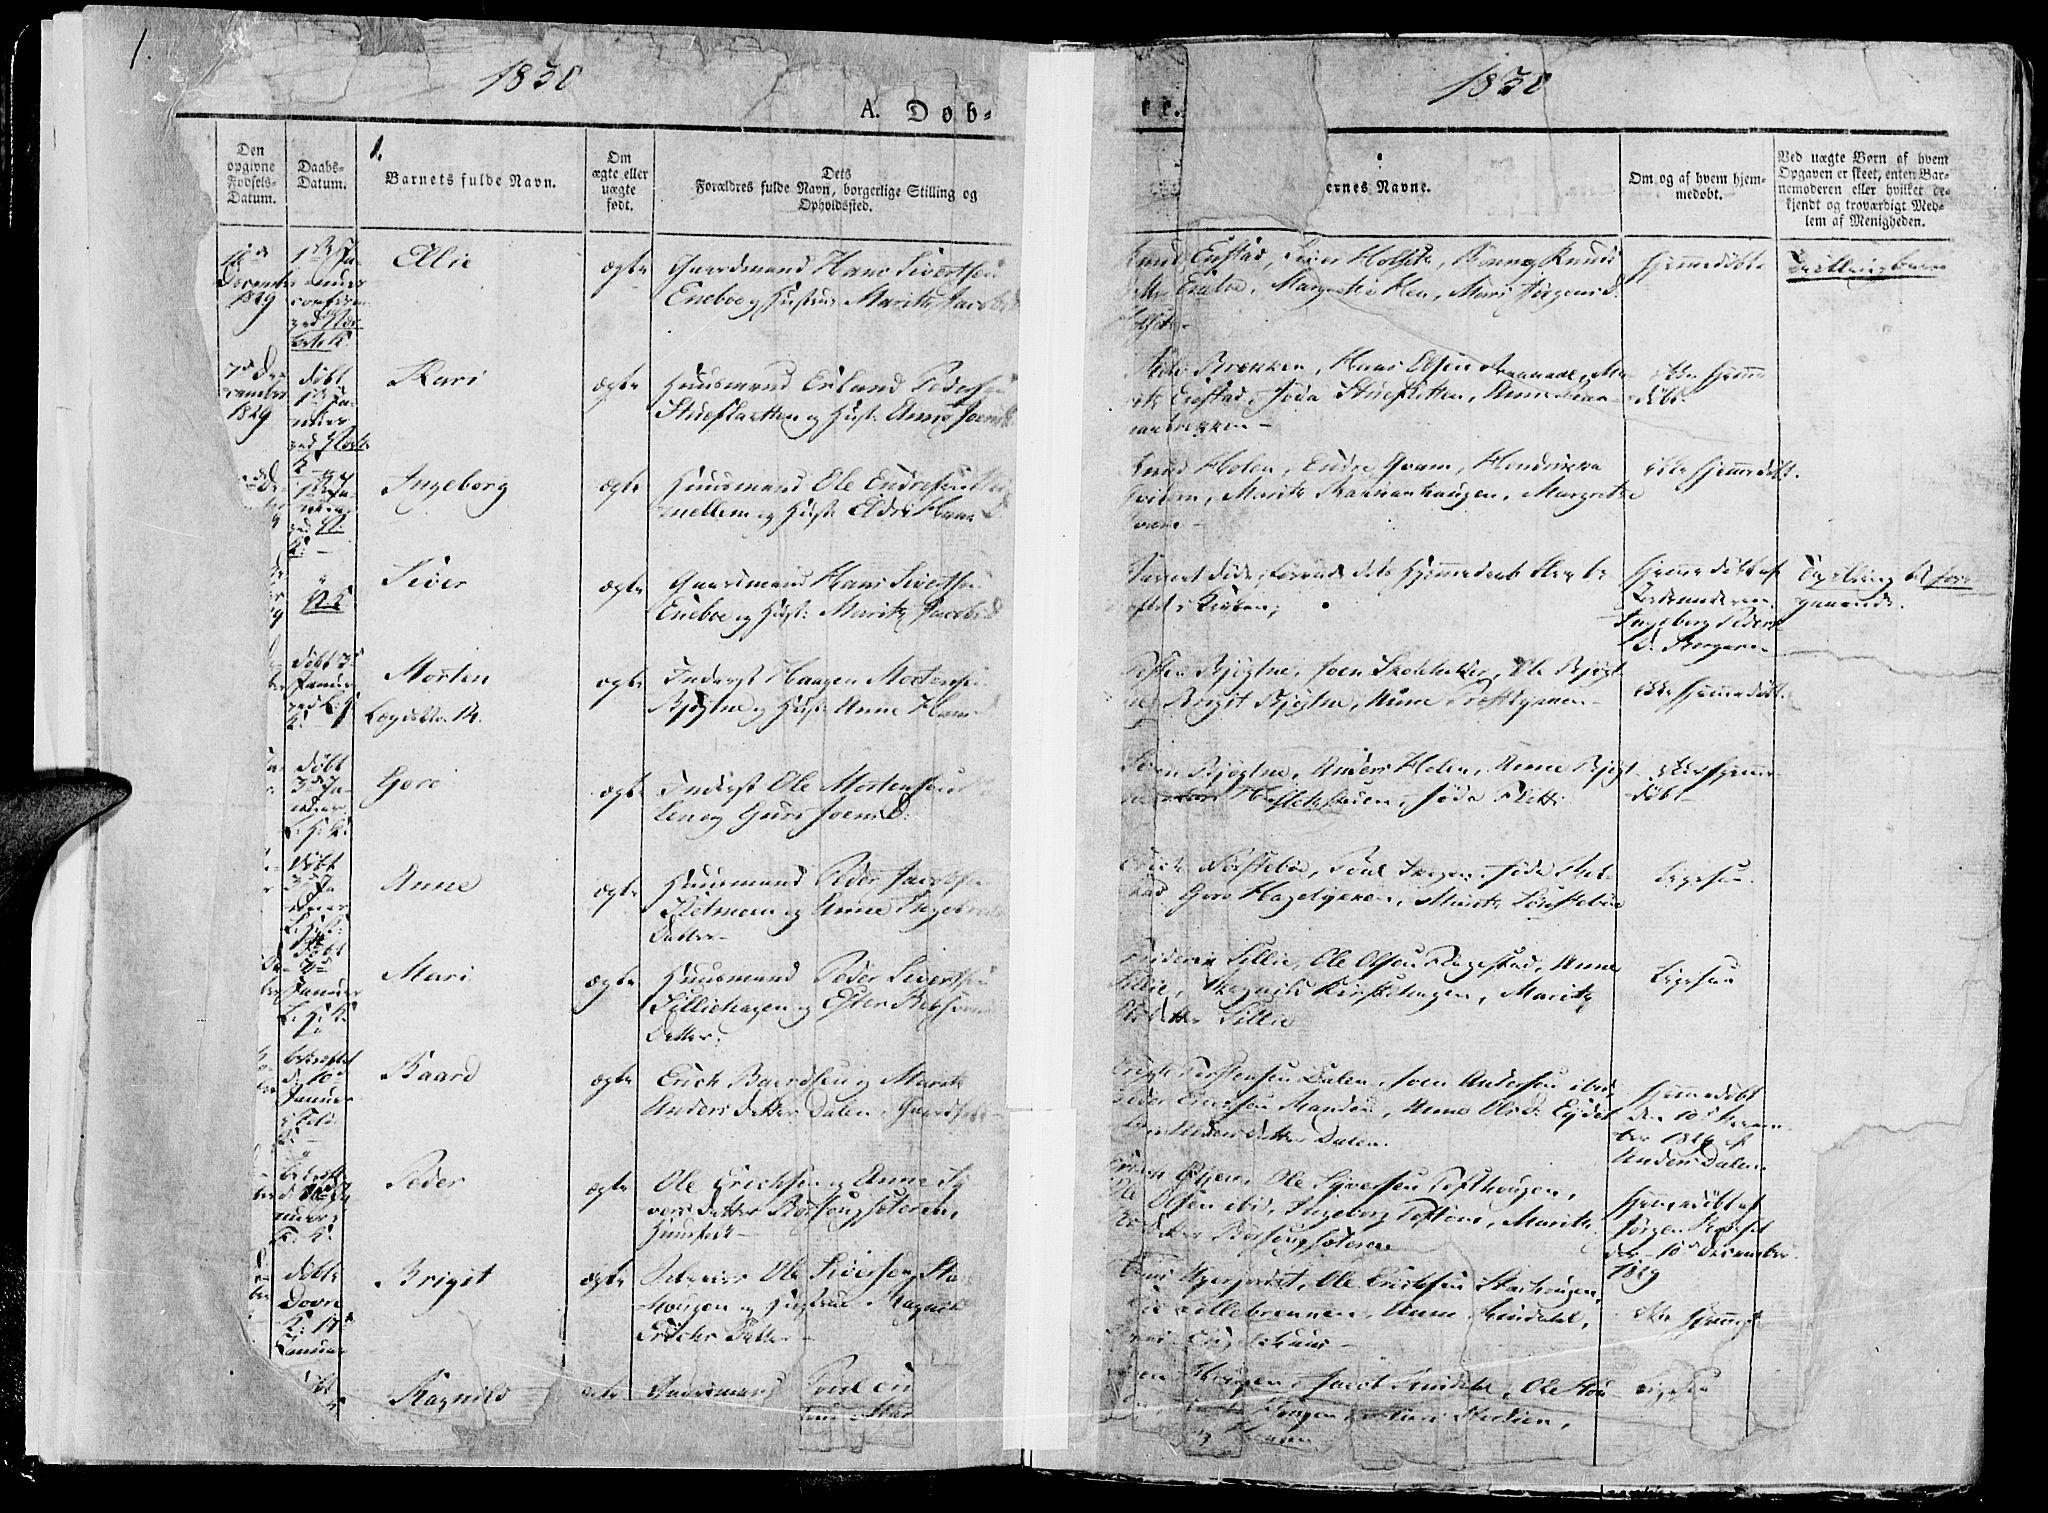 SAH, Lesja prestekontor, Ministerialbok nr. 5, 1830-1842, s. 1